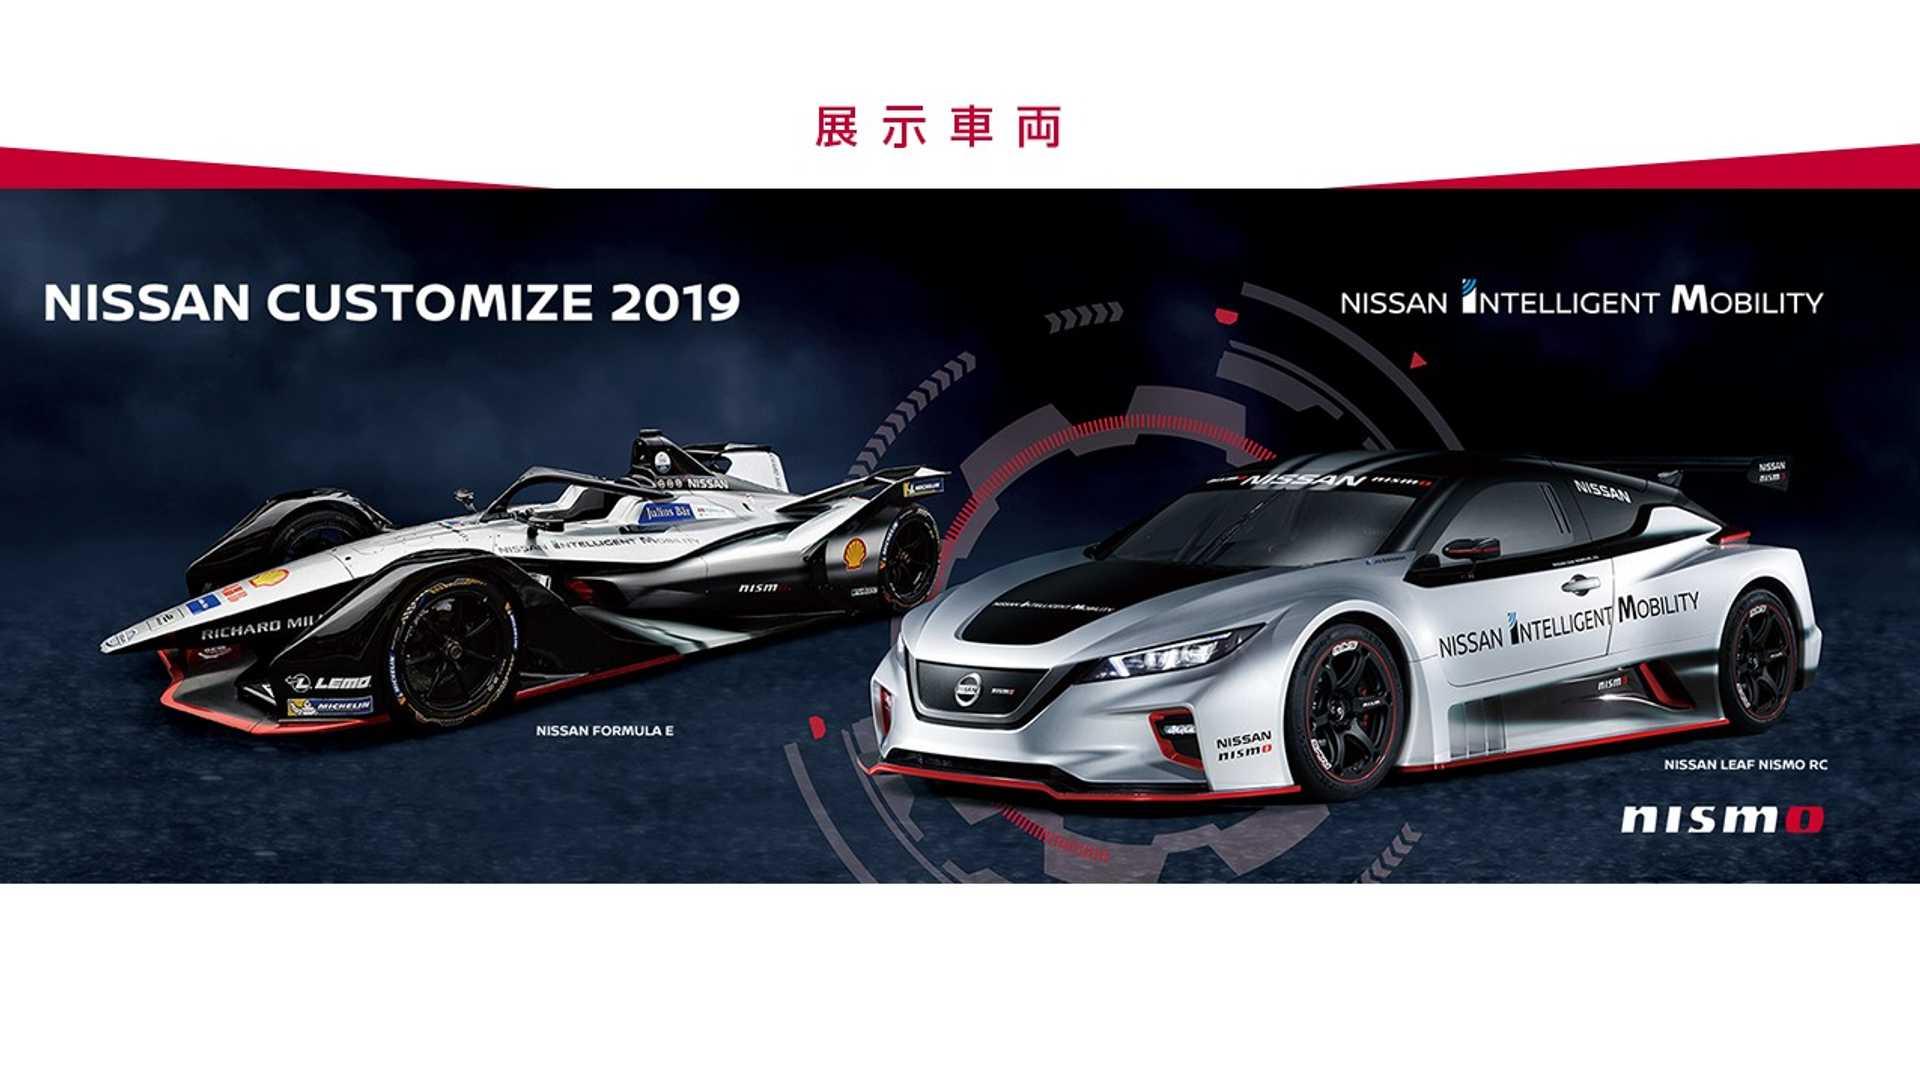 nissan-at-the-tokyo-auto-salon-2019 Nissan Juke Snowmobile si alte exclusivitati se indreapta spre Salonul Auto Tokyo